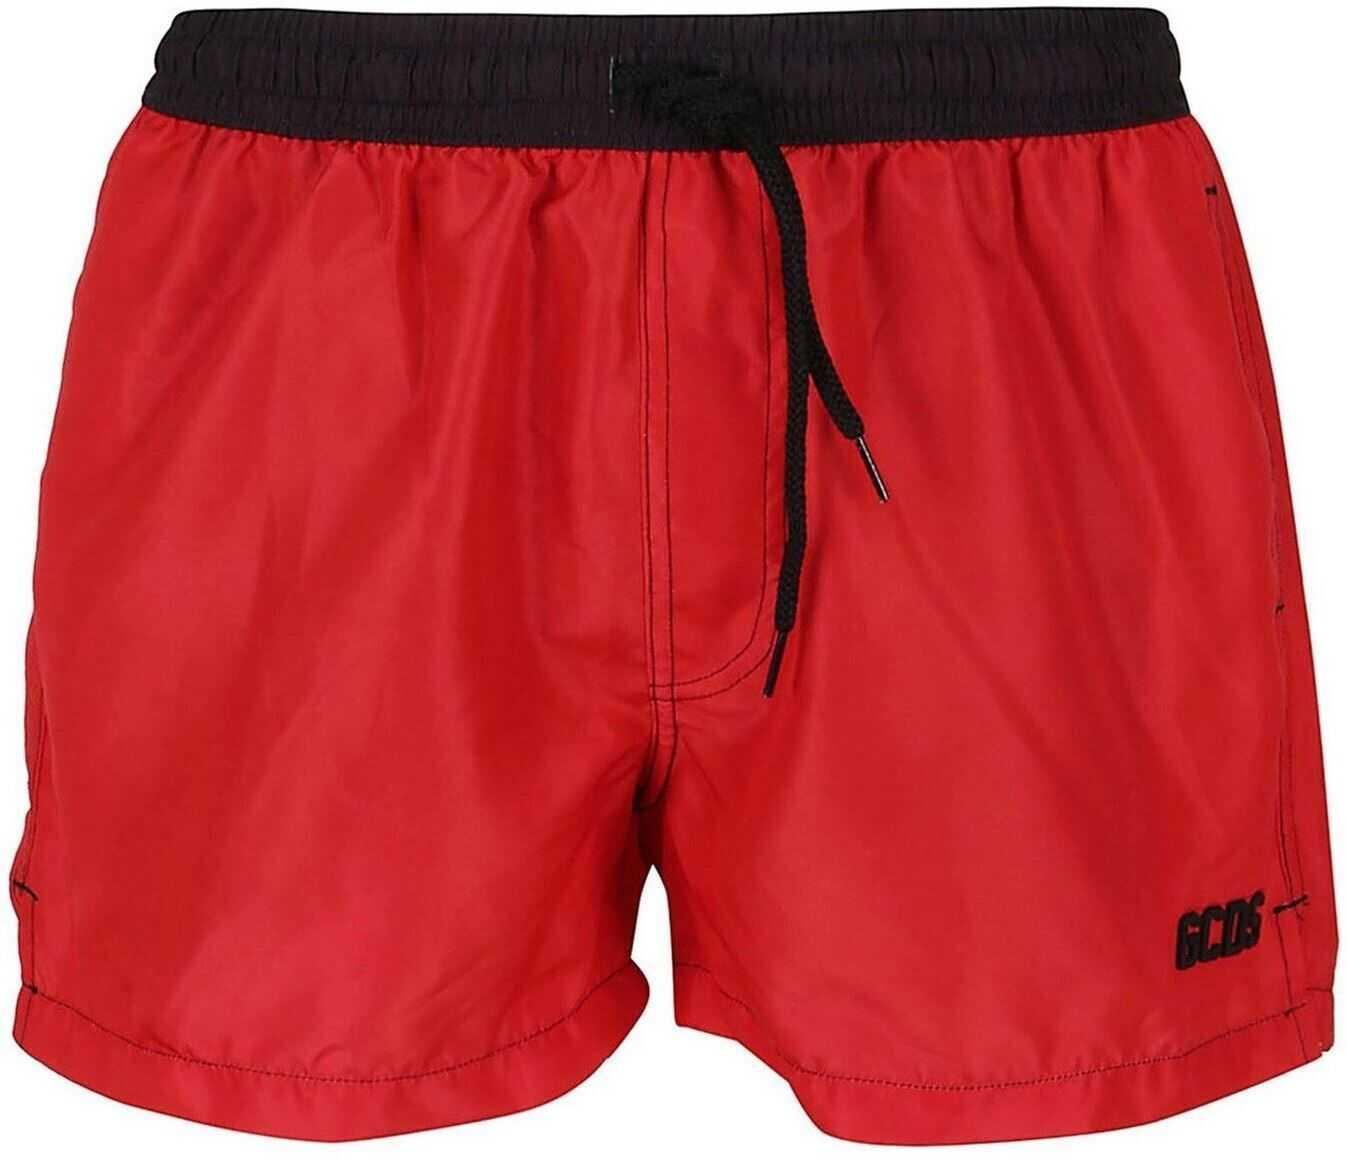 GCDS Two-Tone Nylon Swim Shorts Red imagine